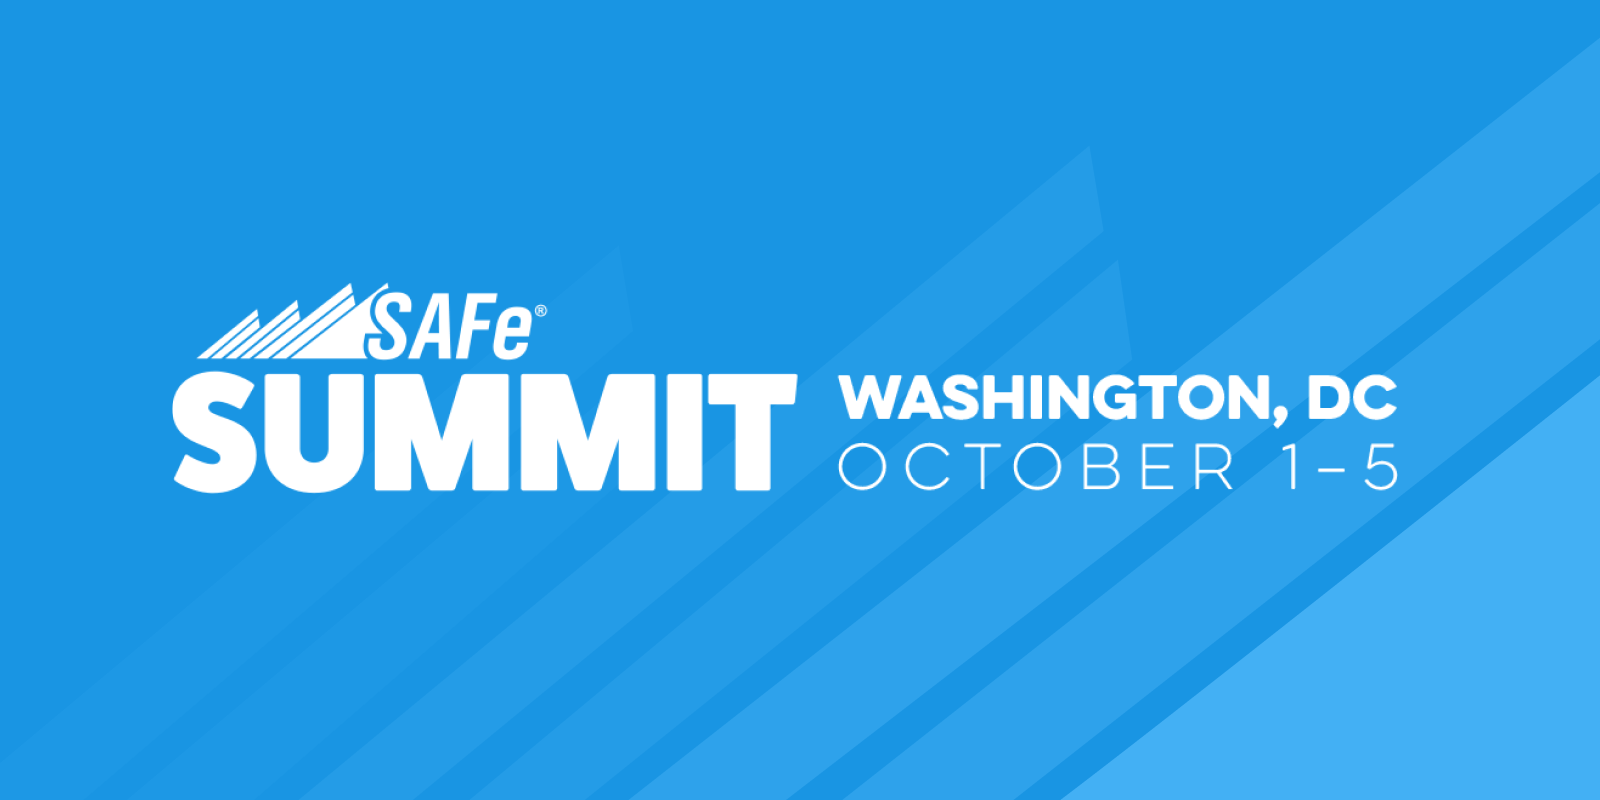 SAFe Summit 2019, Steve Moubray presented Communities of Practice